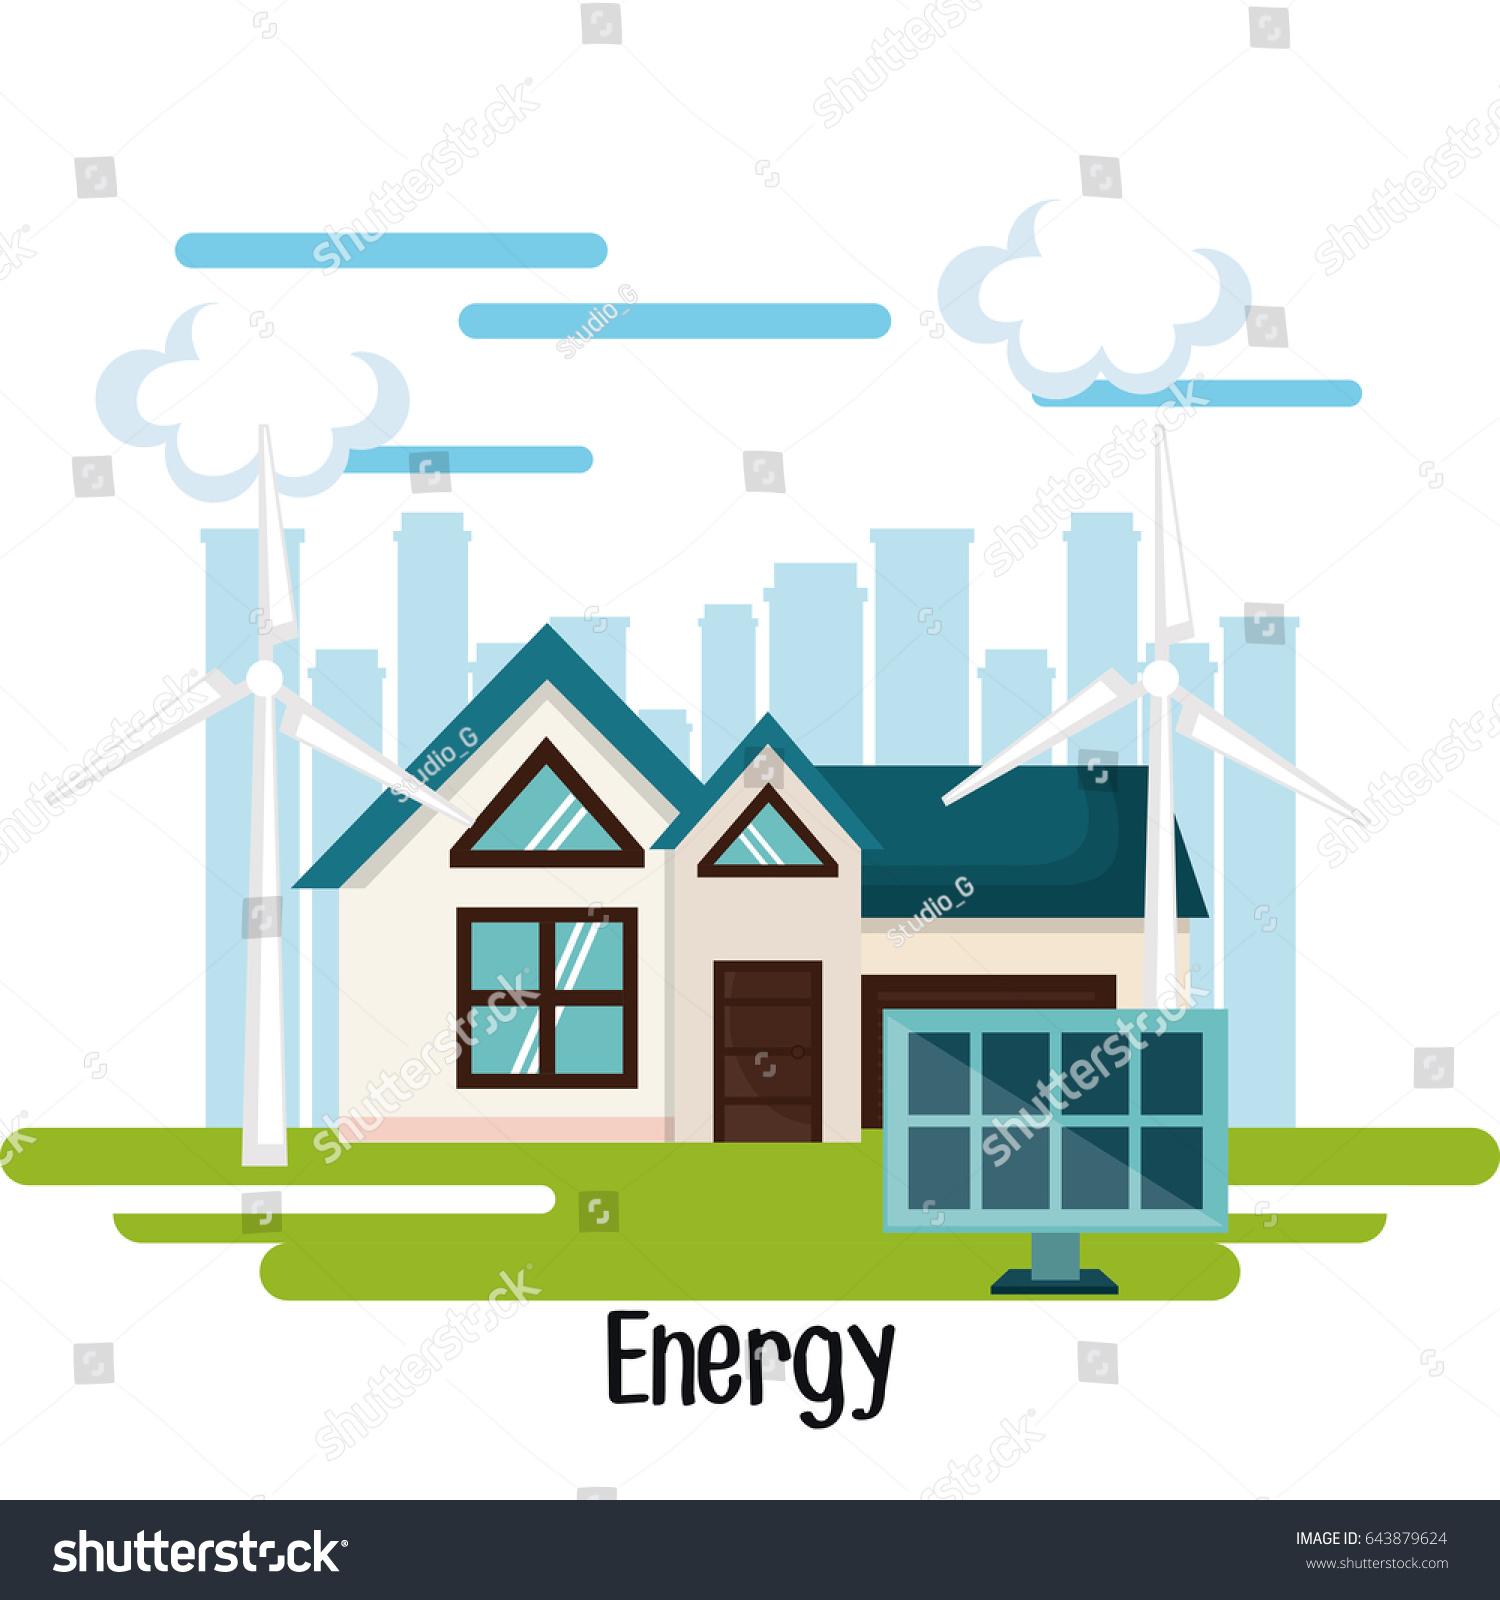 Eco Friendly House Design Stock Vector 643879624 - Shutterstock